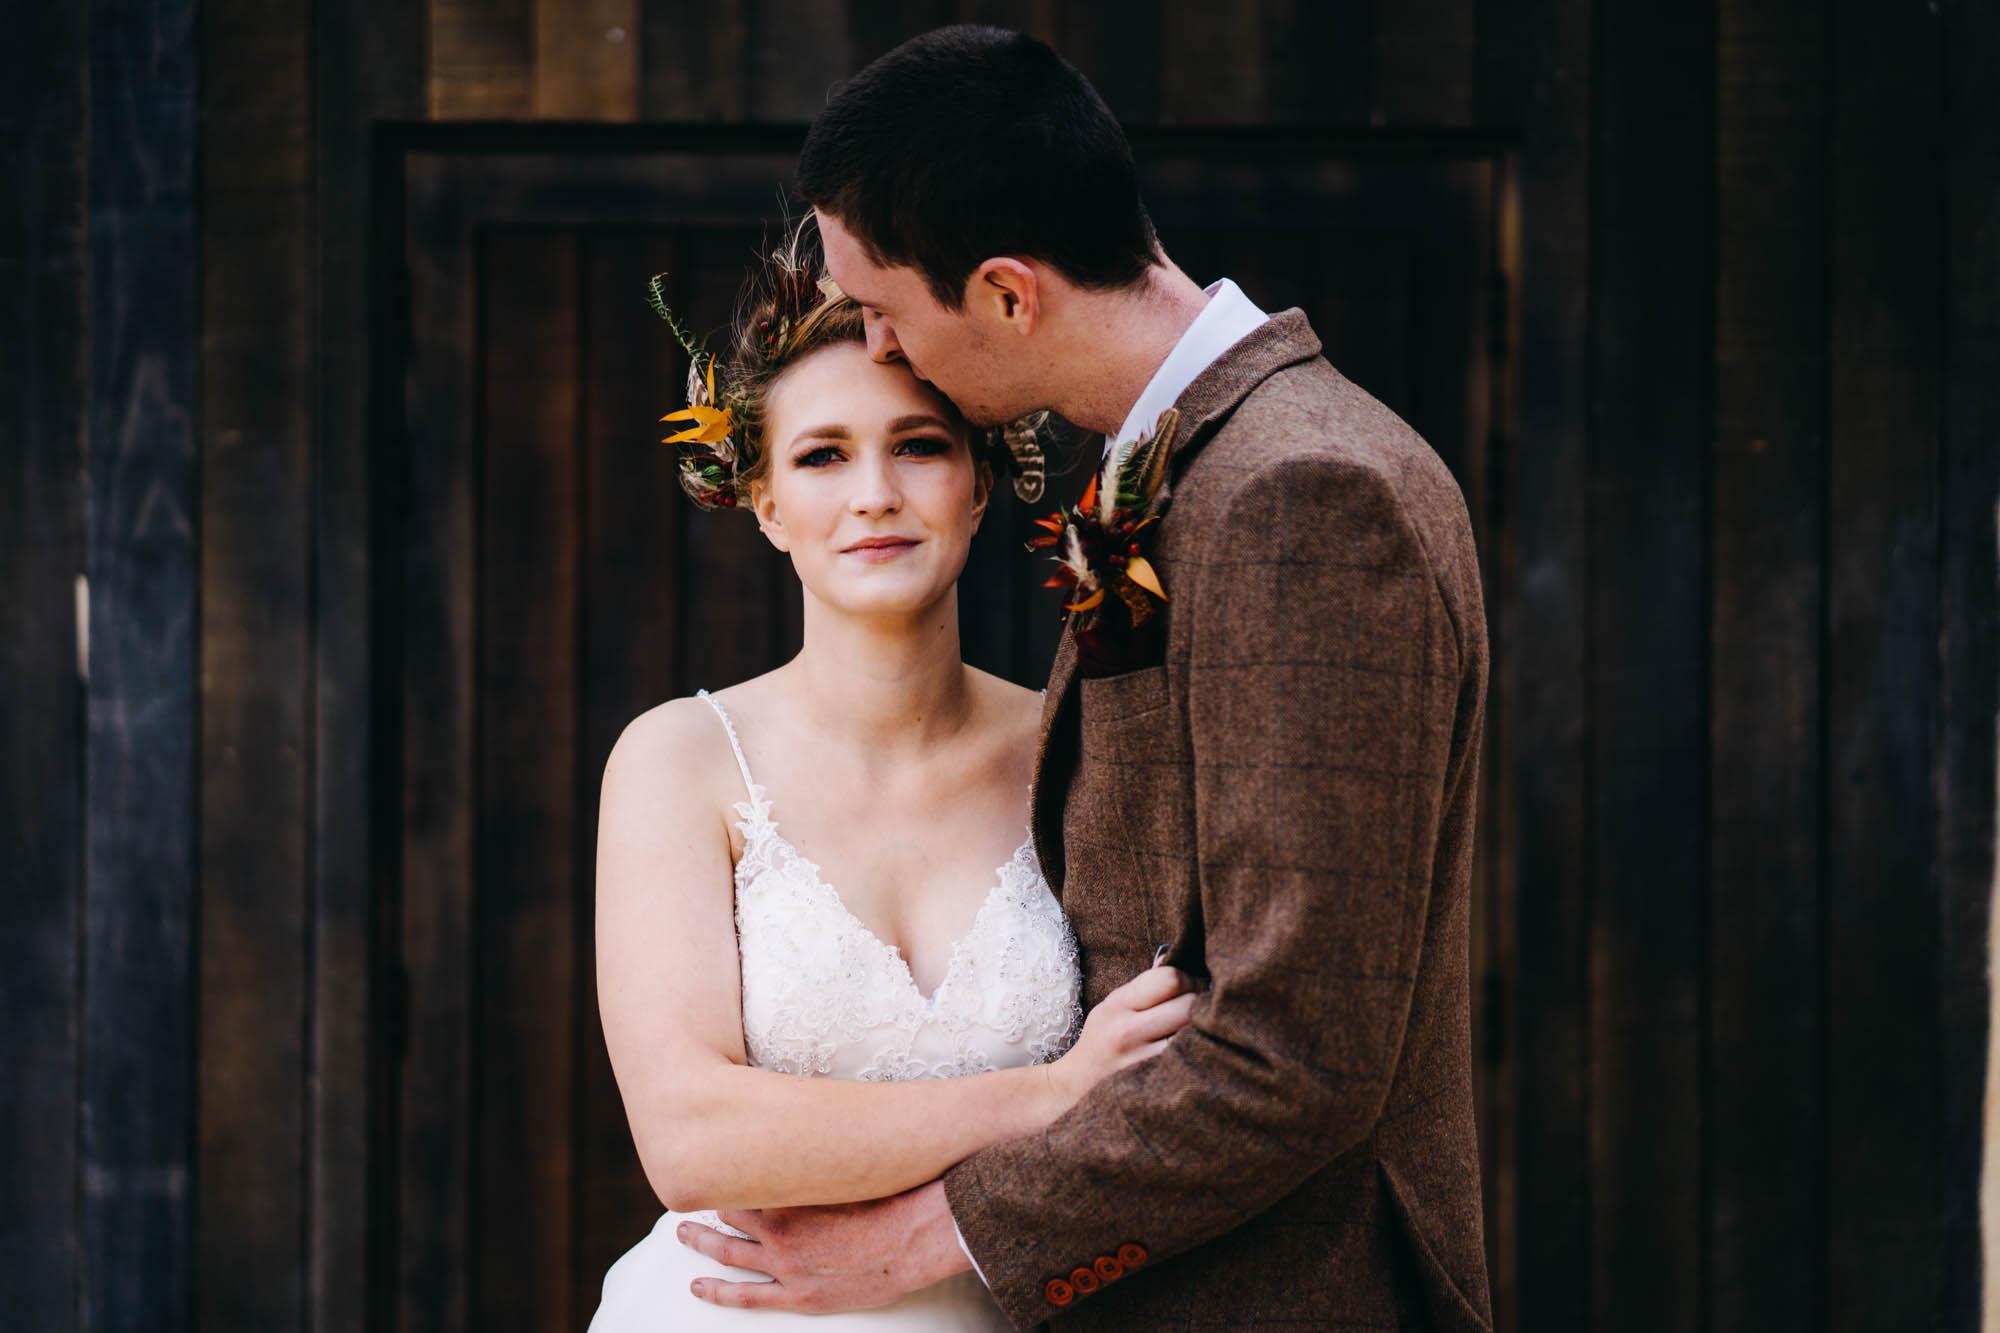 huntsmill-farm-wedding-inspiration-22